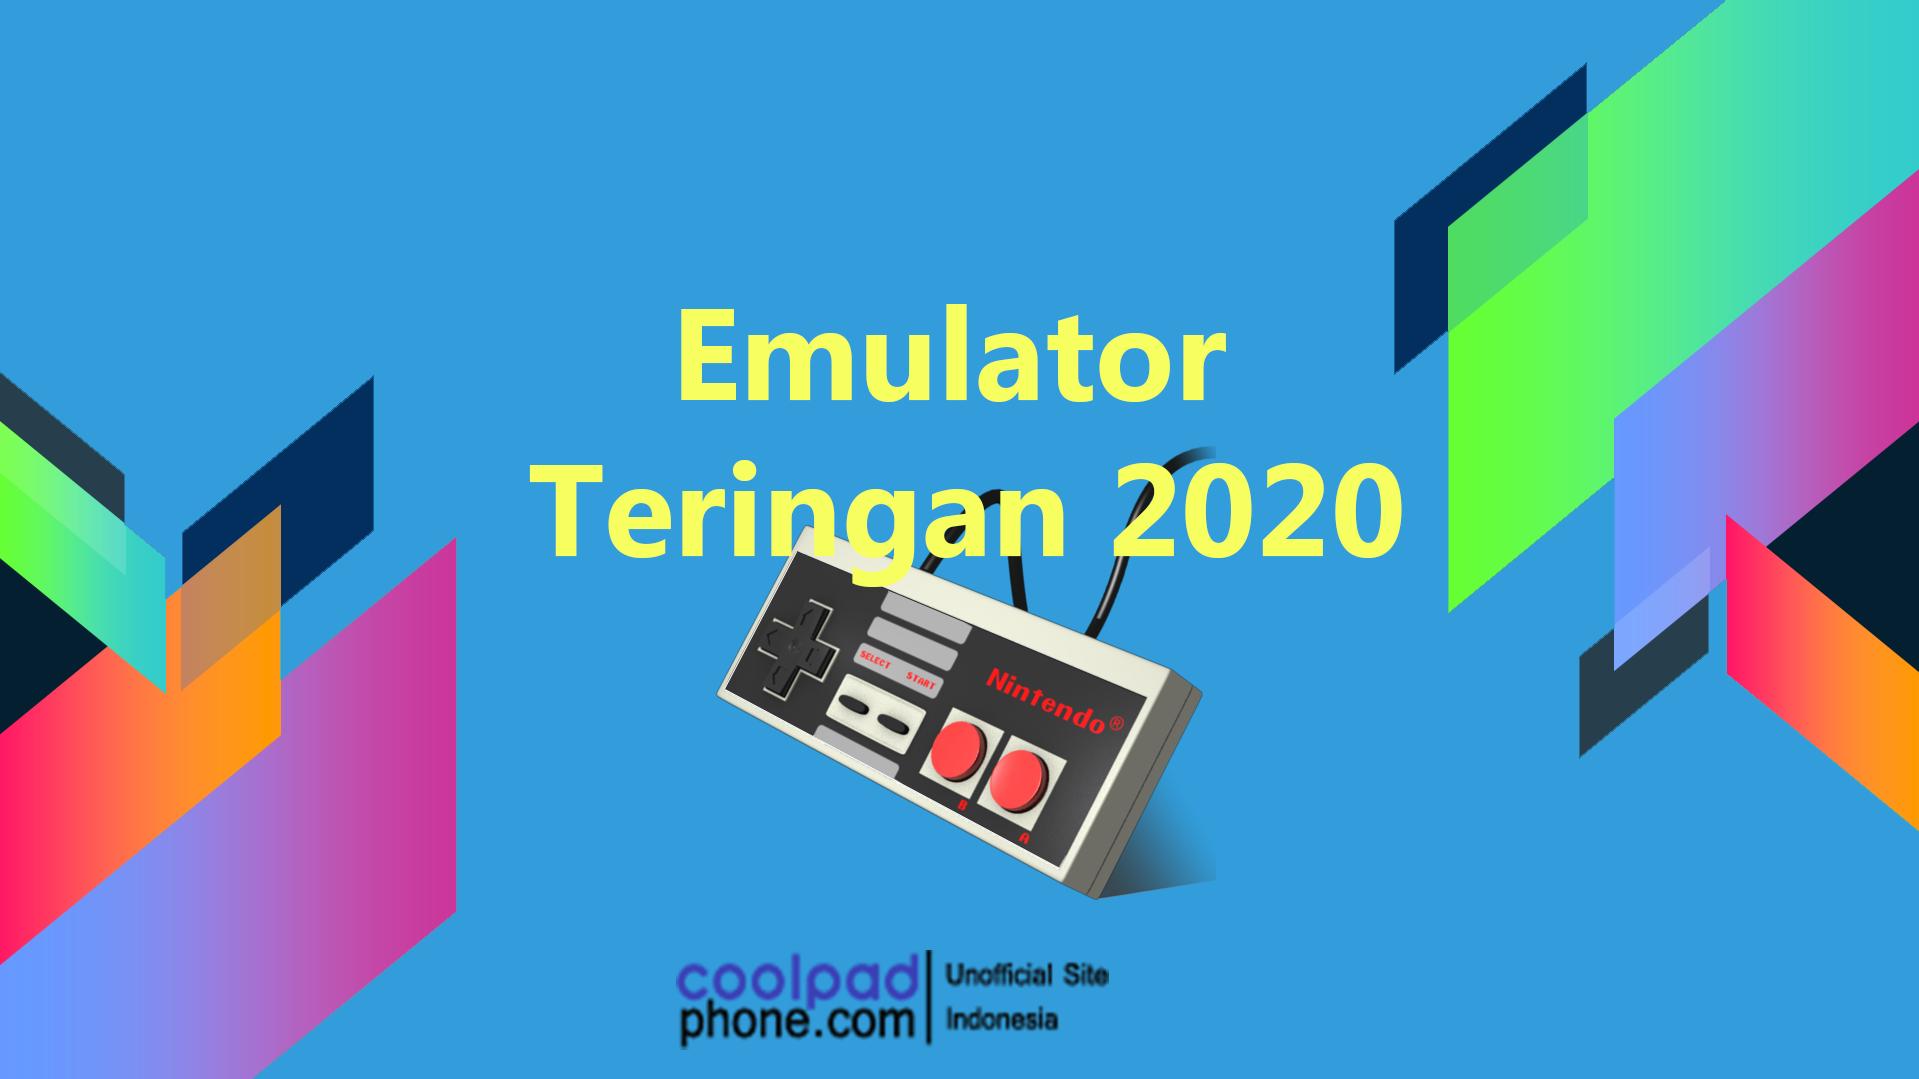 Emulator Teringan 2020